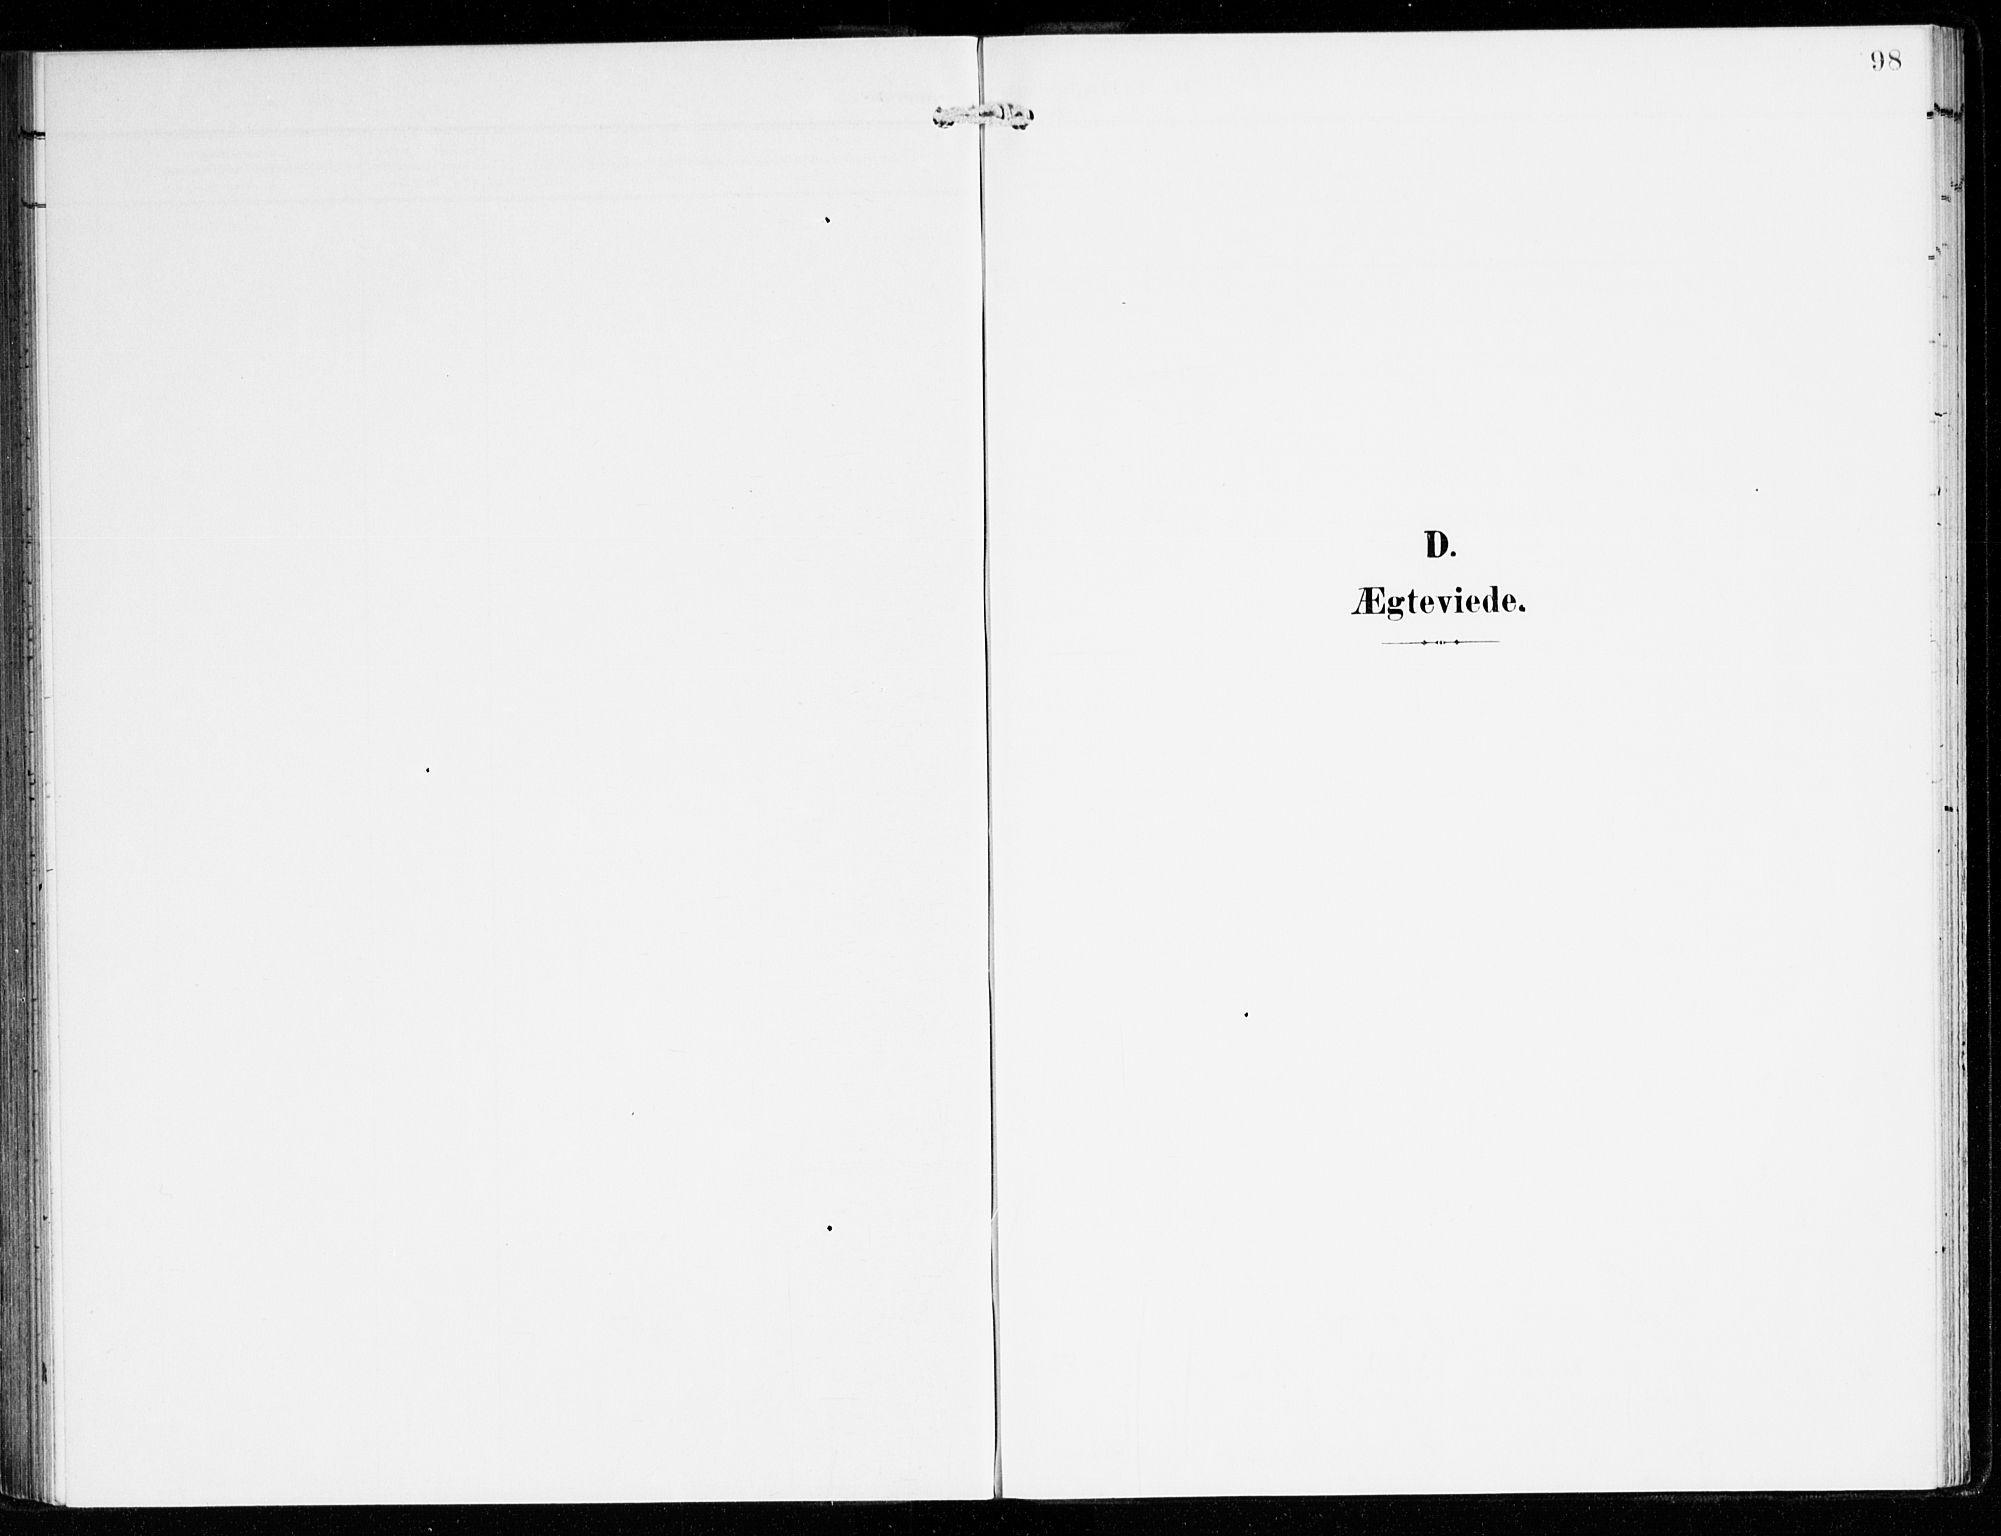 SAB, Hyllestad Sokneprestembete, Ministerialbok nr. B 2, 1903-1917, s. 98